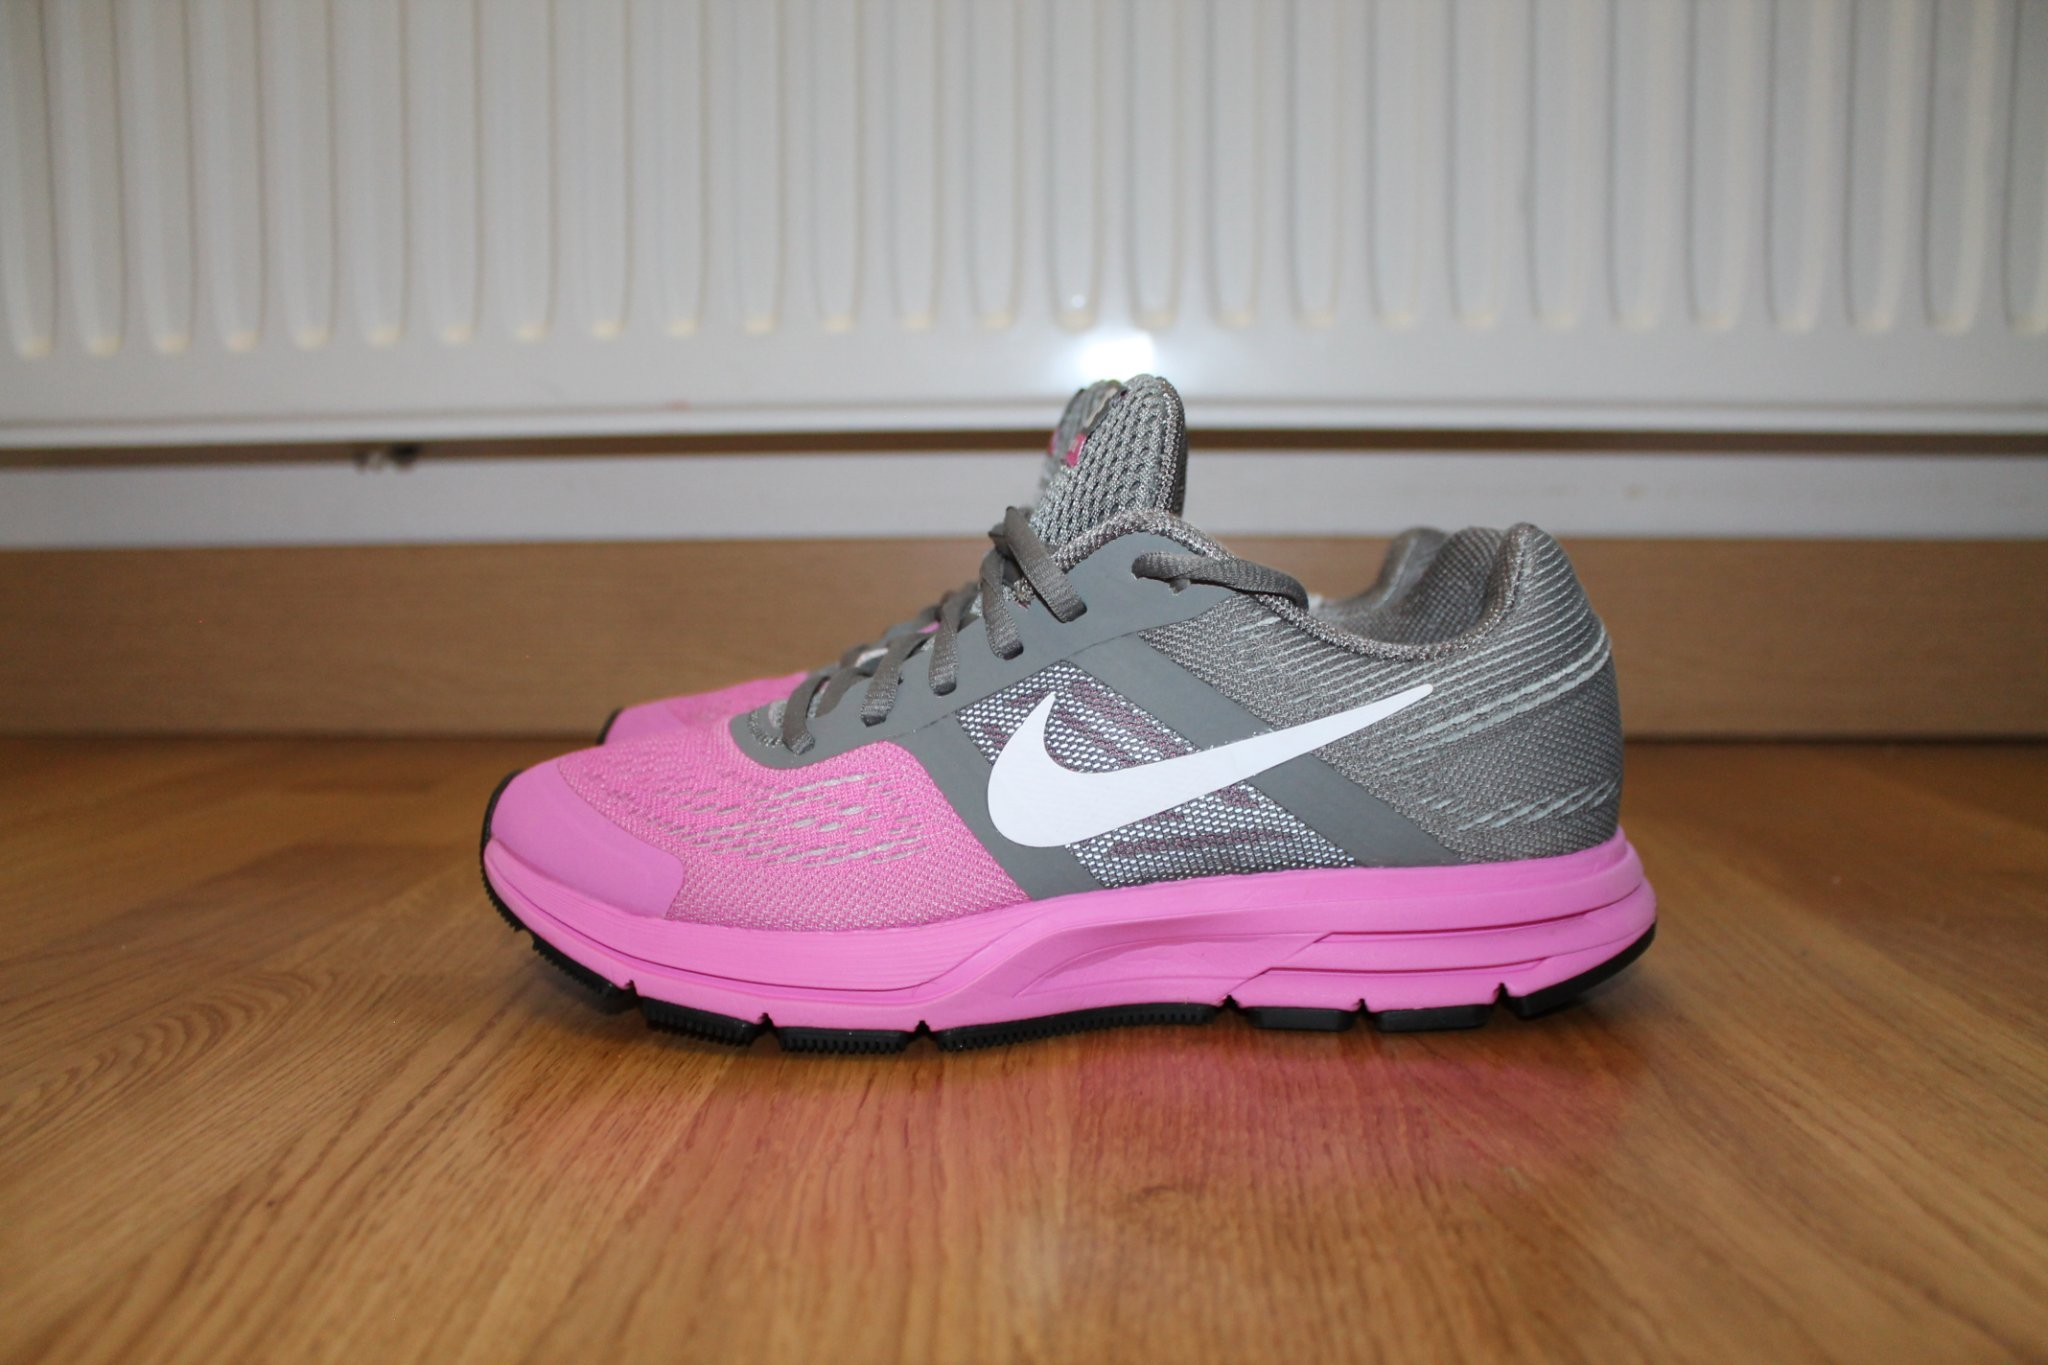 best service 6ddc5 f8c93 Nike Pegasus 30 Träningsskor i storlek 38 !!! i fint skick ...